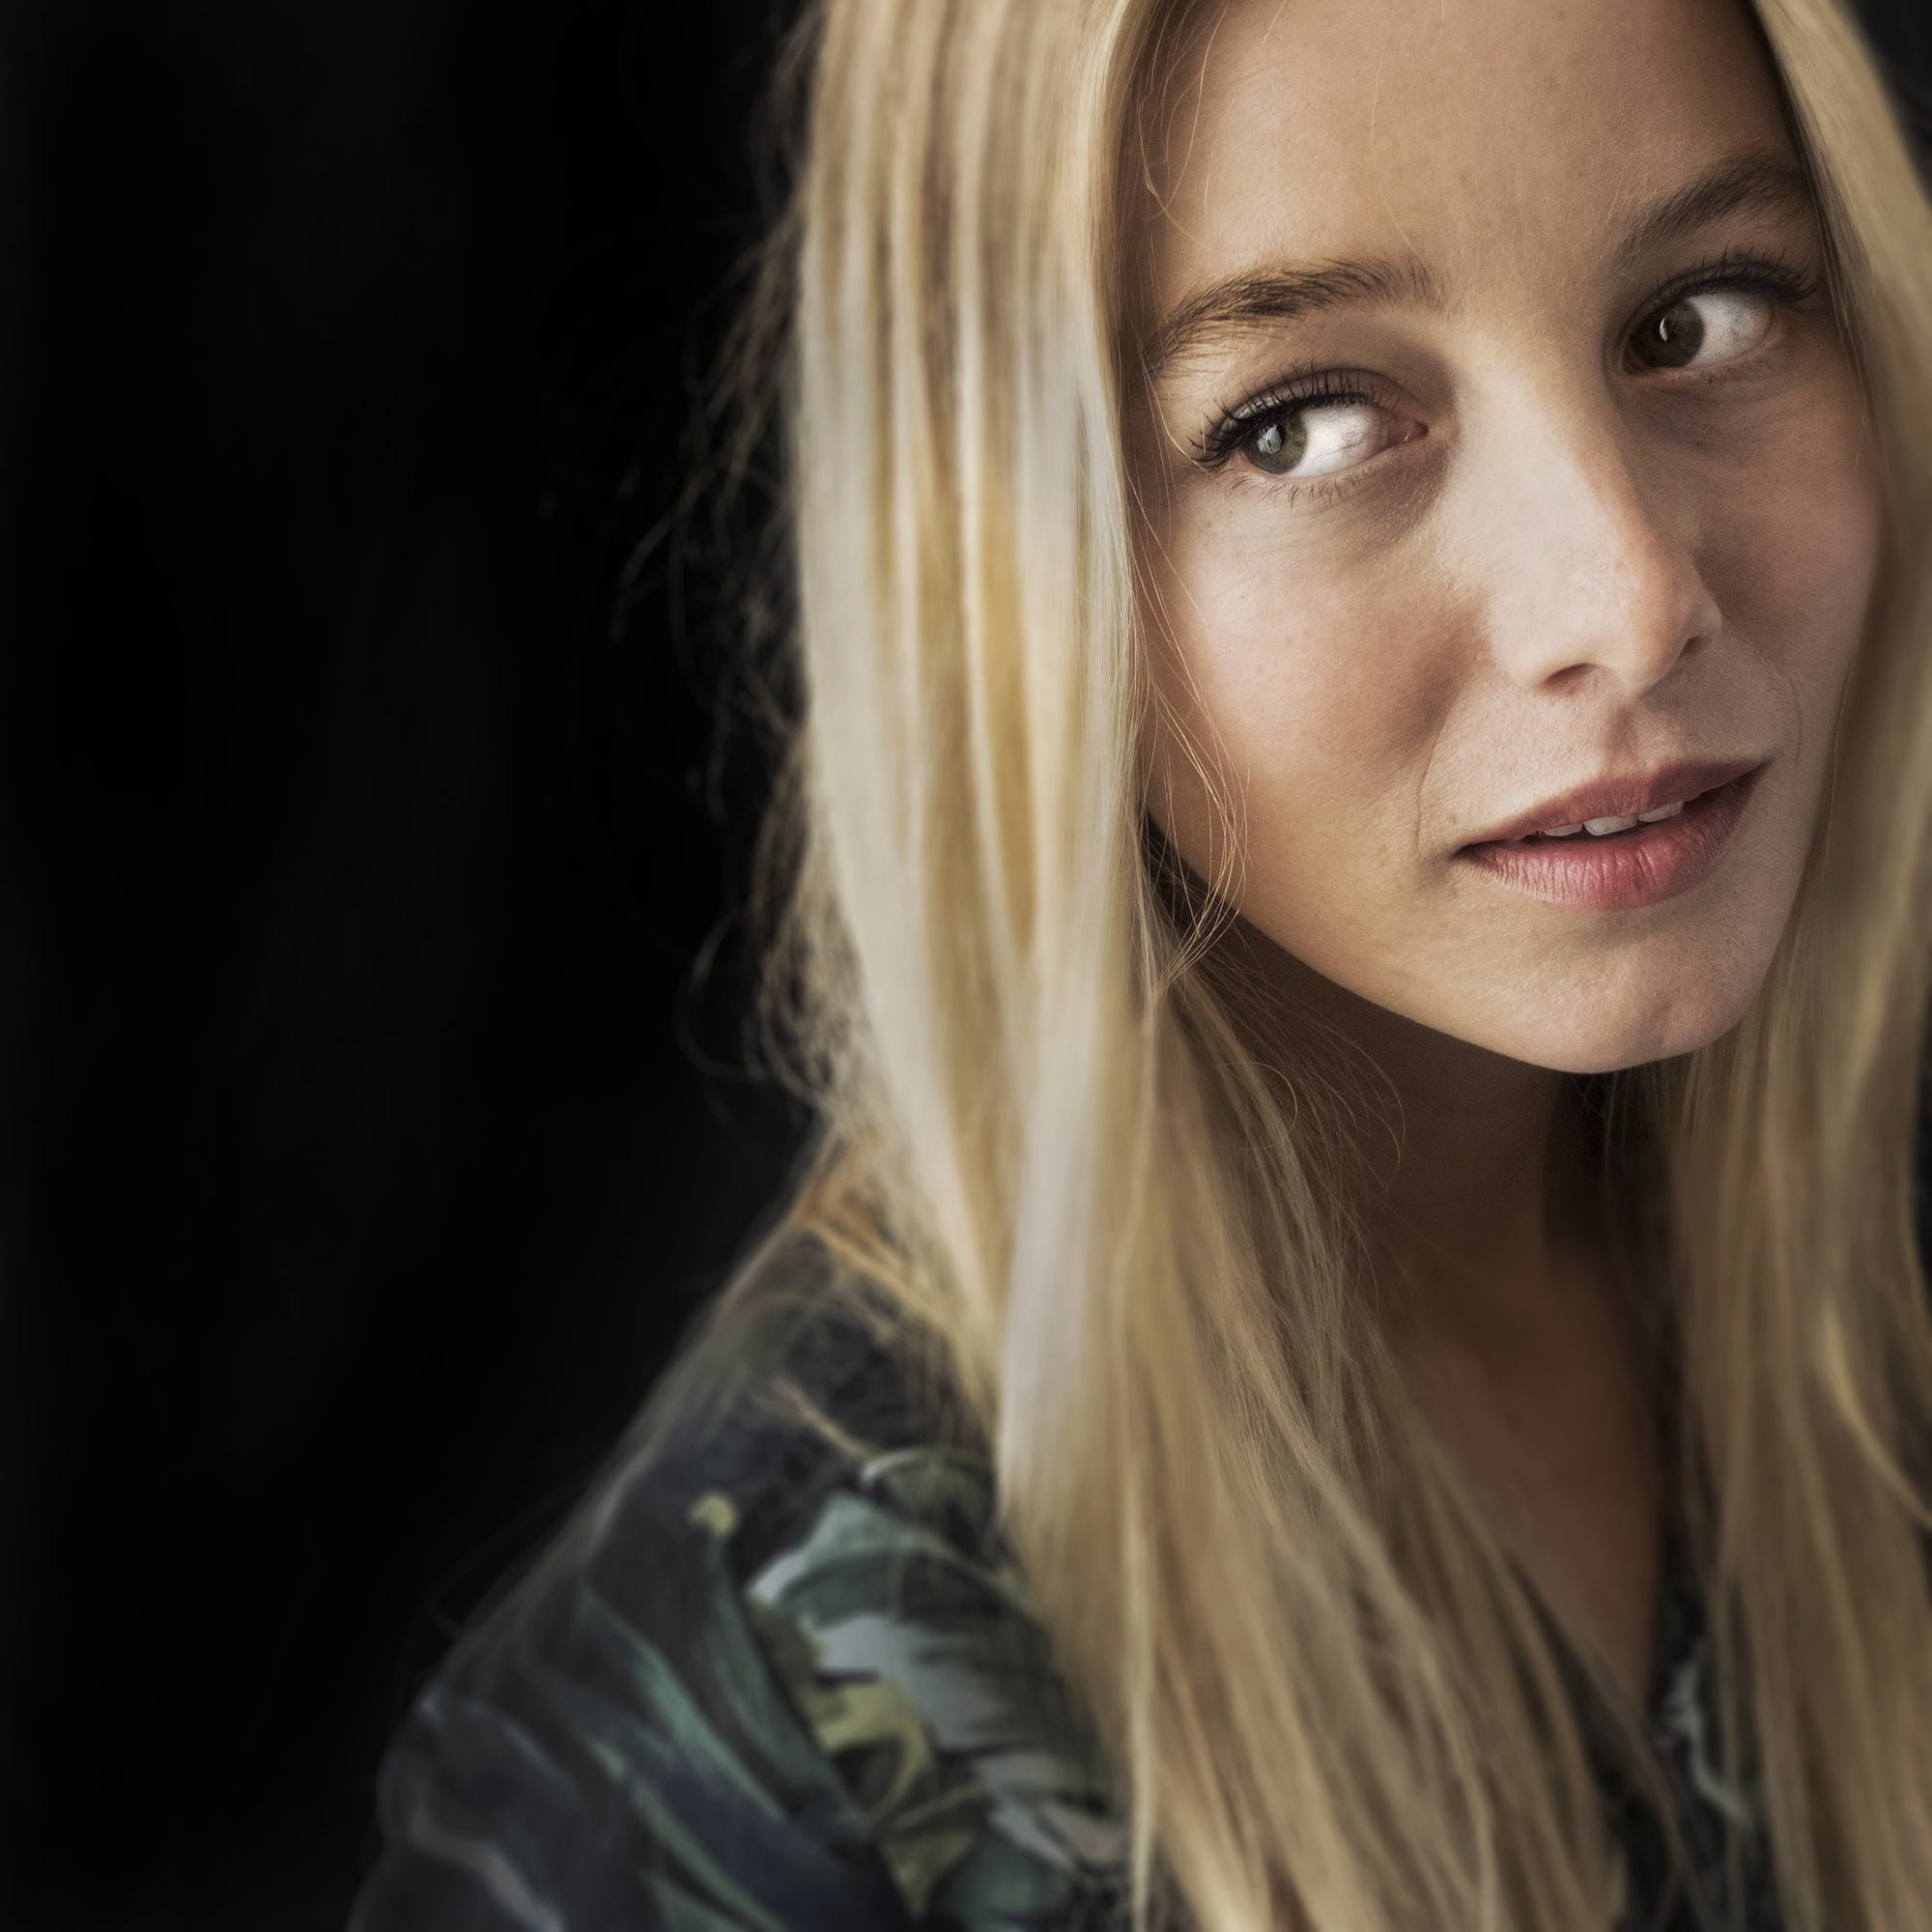 Vega charlotte Charlotte Vega: